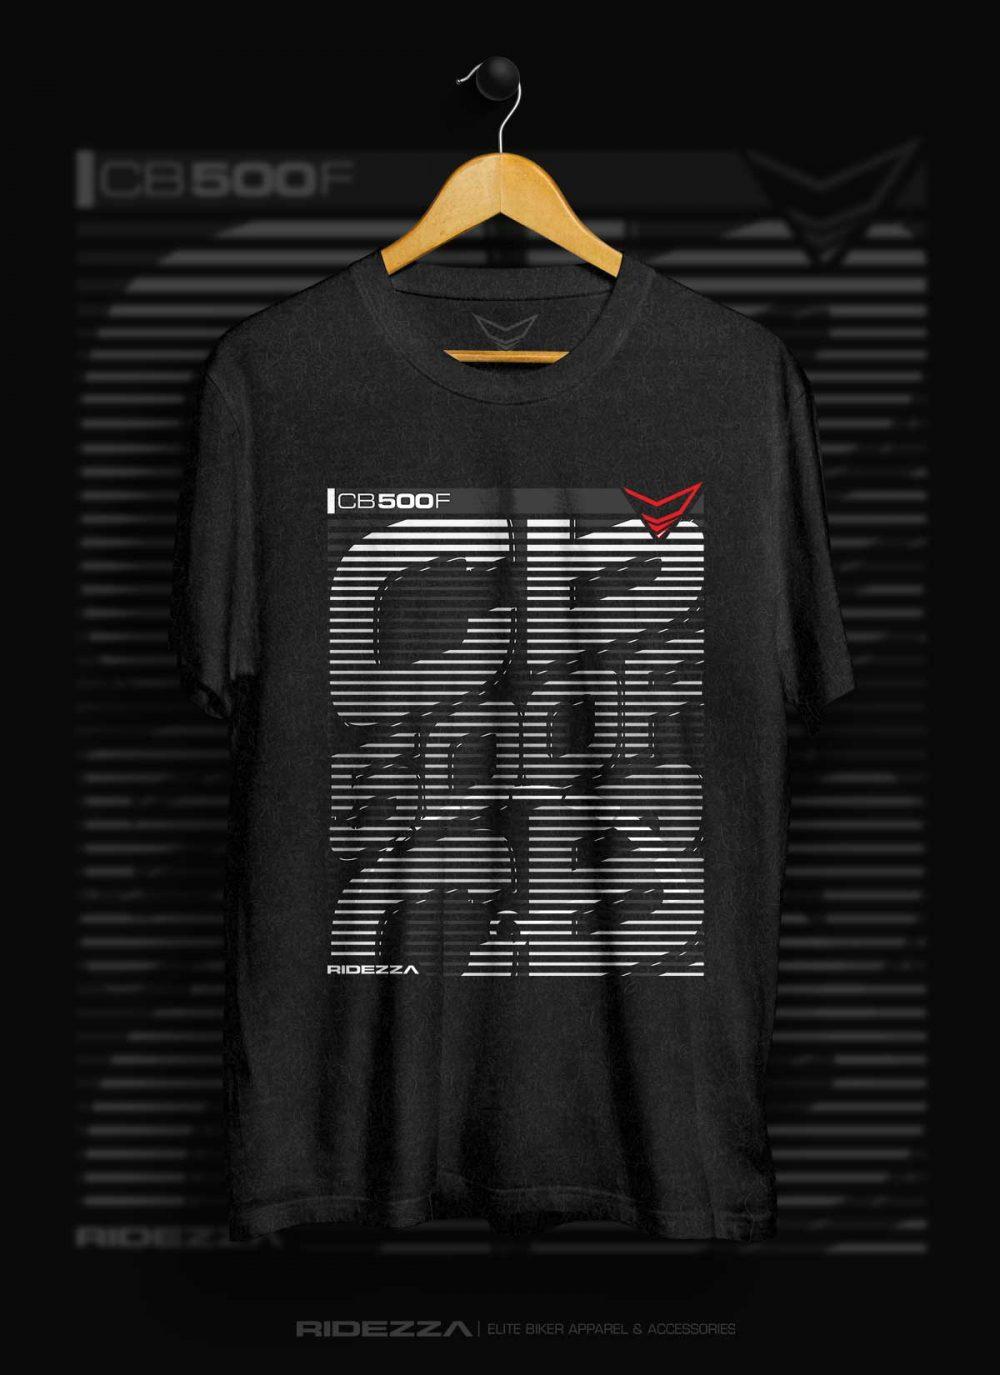 Honda CB500F Speedy T-Shirt